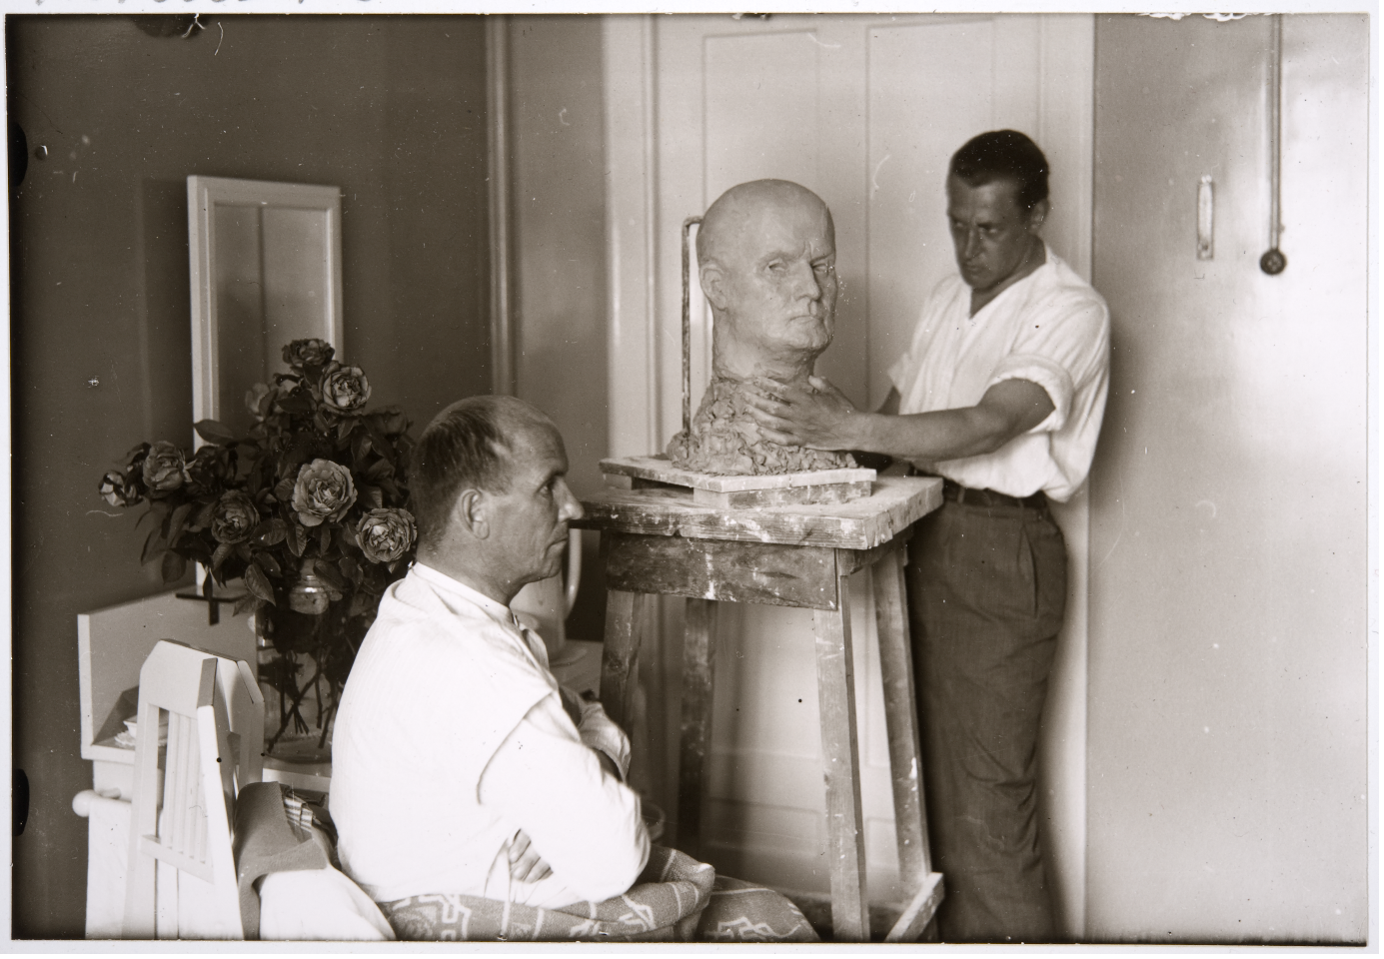 A man poses whilst an artist creates a sculpture of him